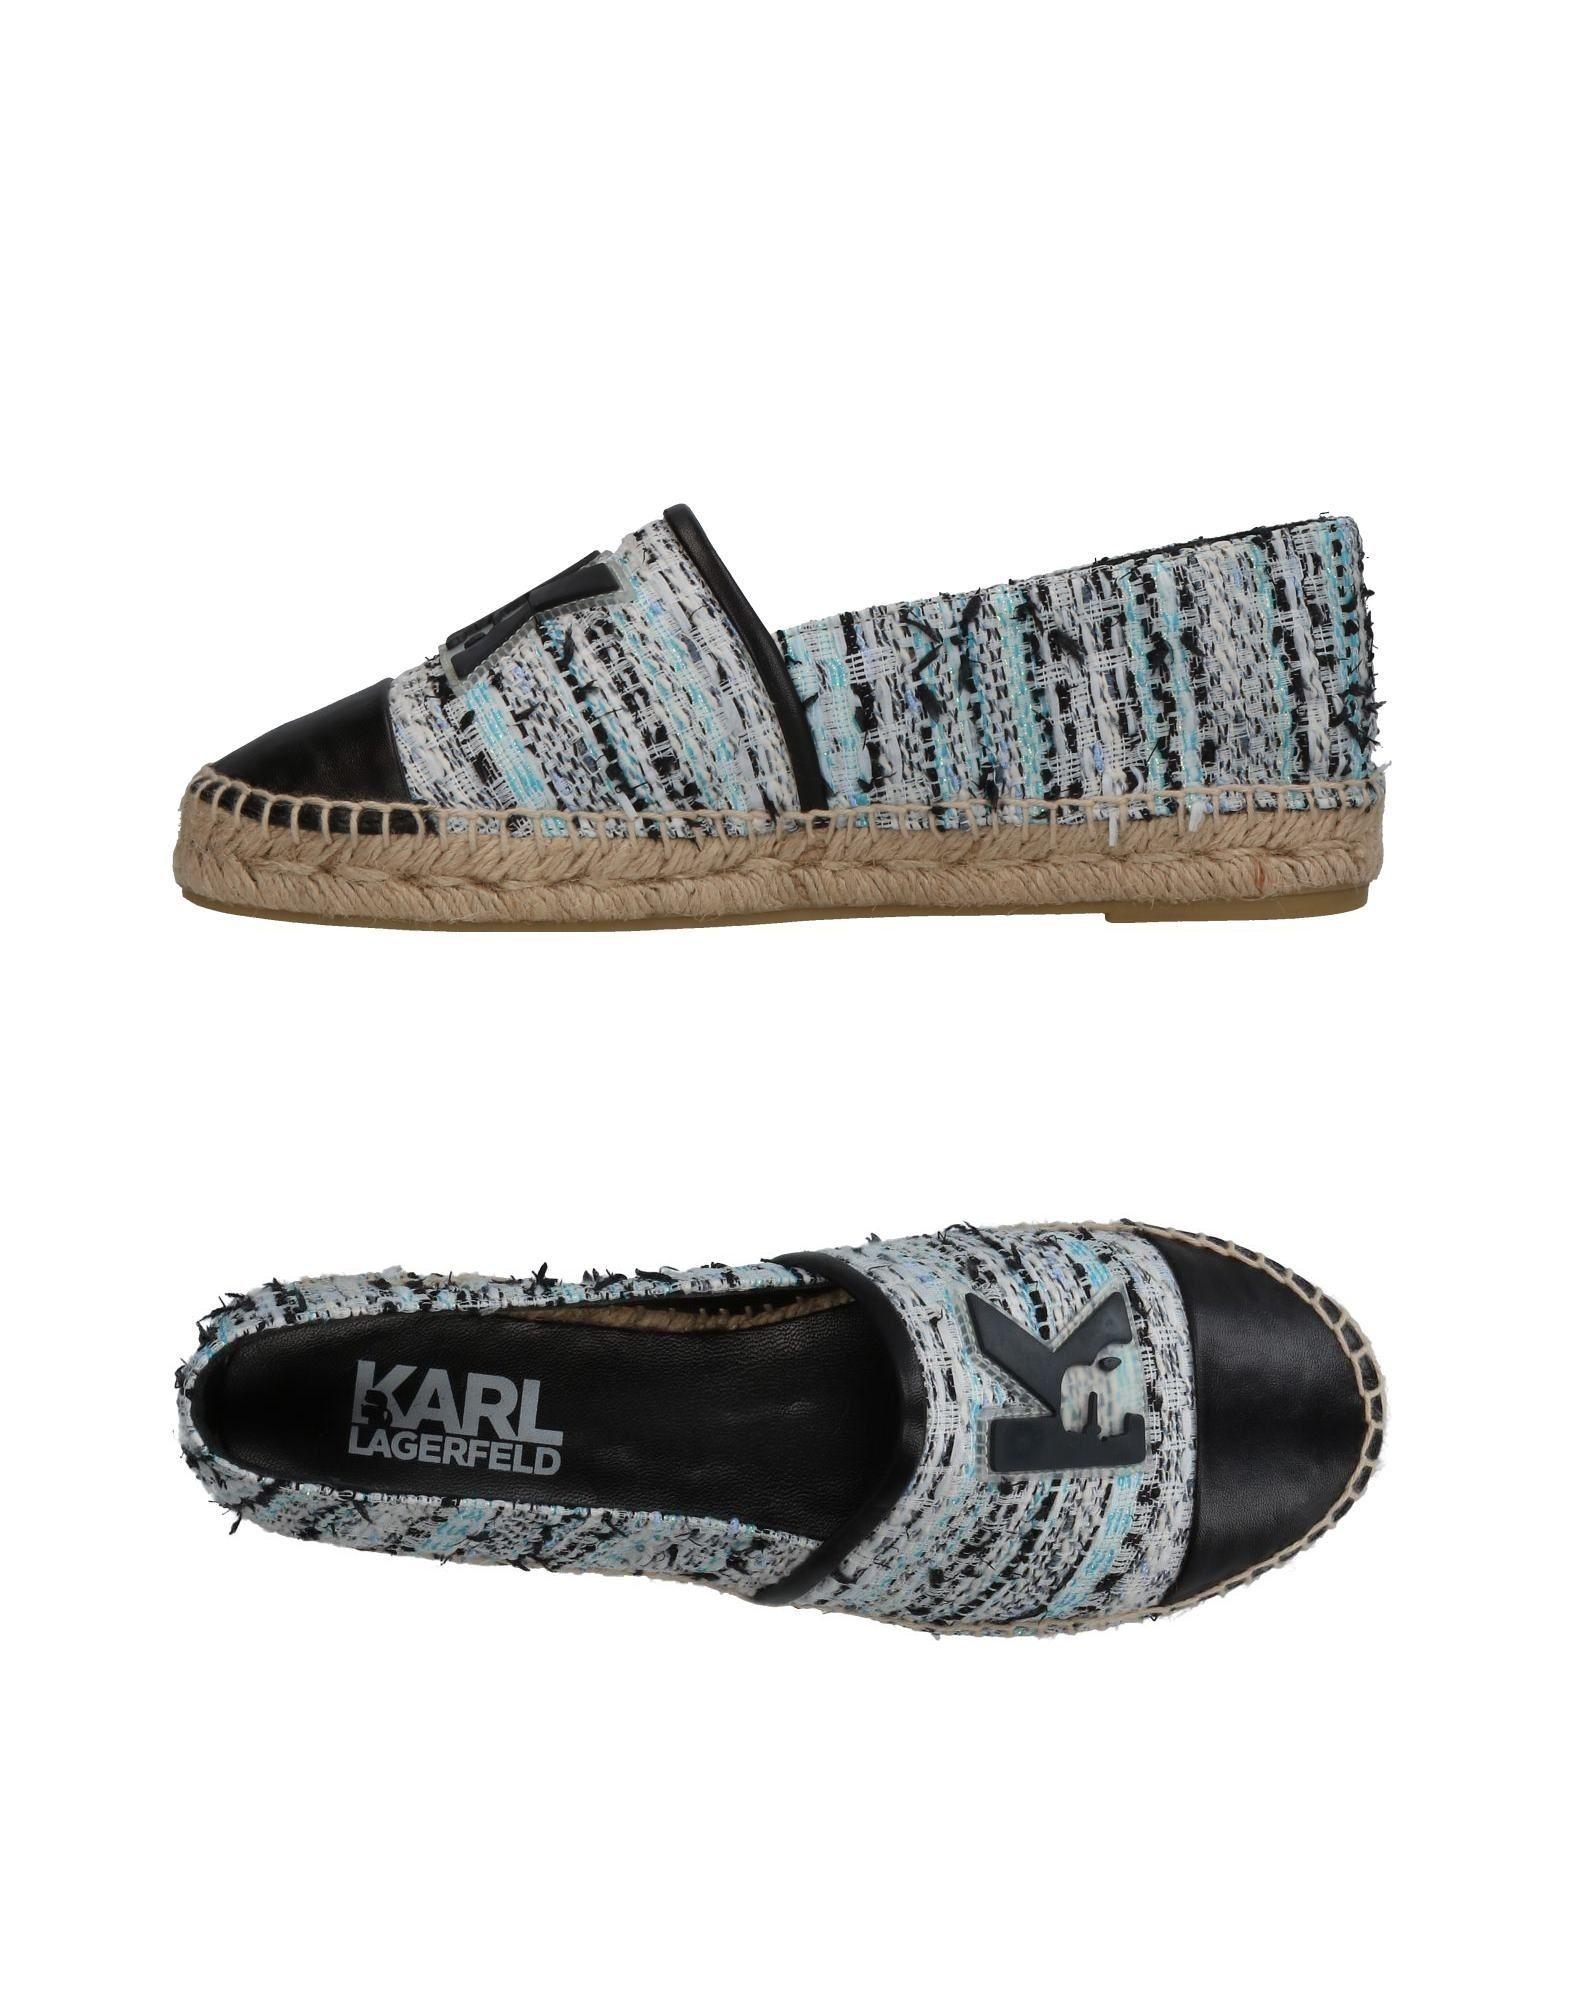 Karl Lagerfeld Espadrilles Damen  11328874RT Gute Qualität beliebte Schuhe